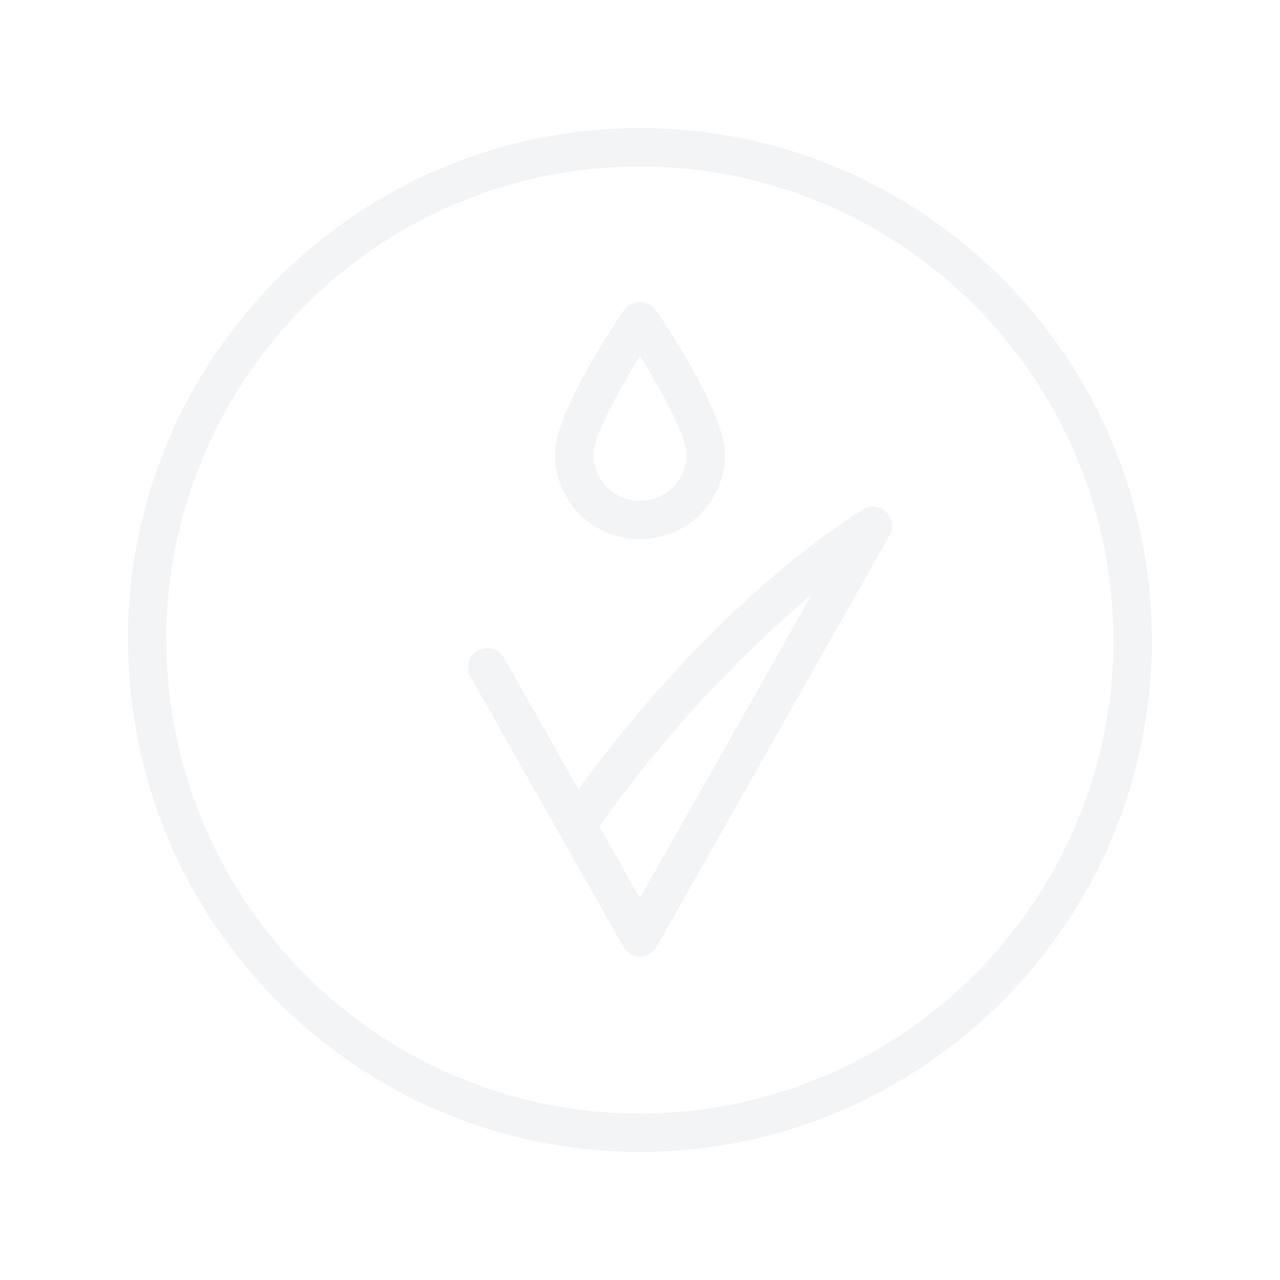 MIZON Joyful Time Essence Pomegranate Mask 23g